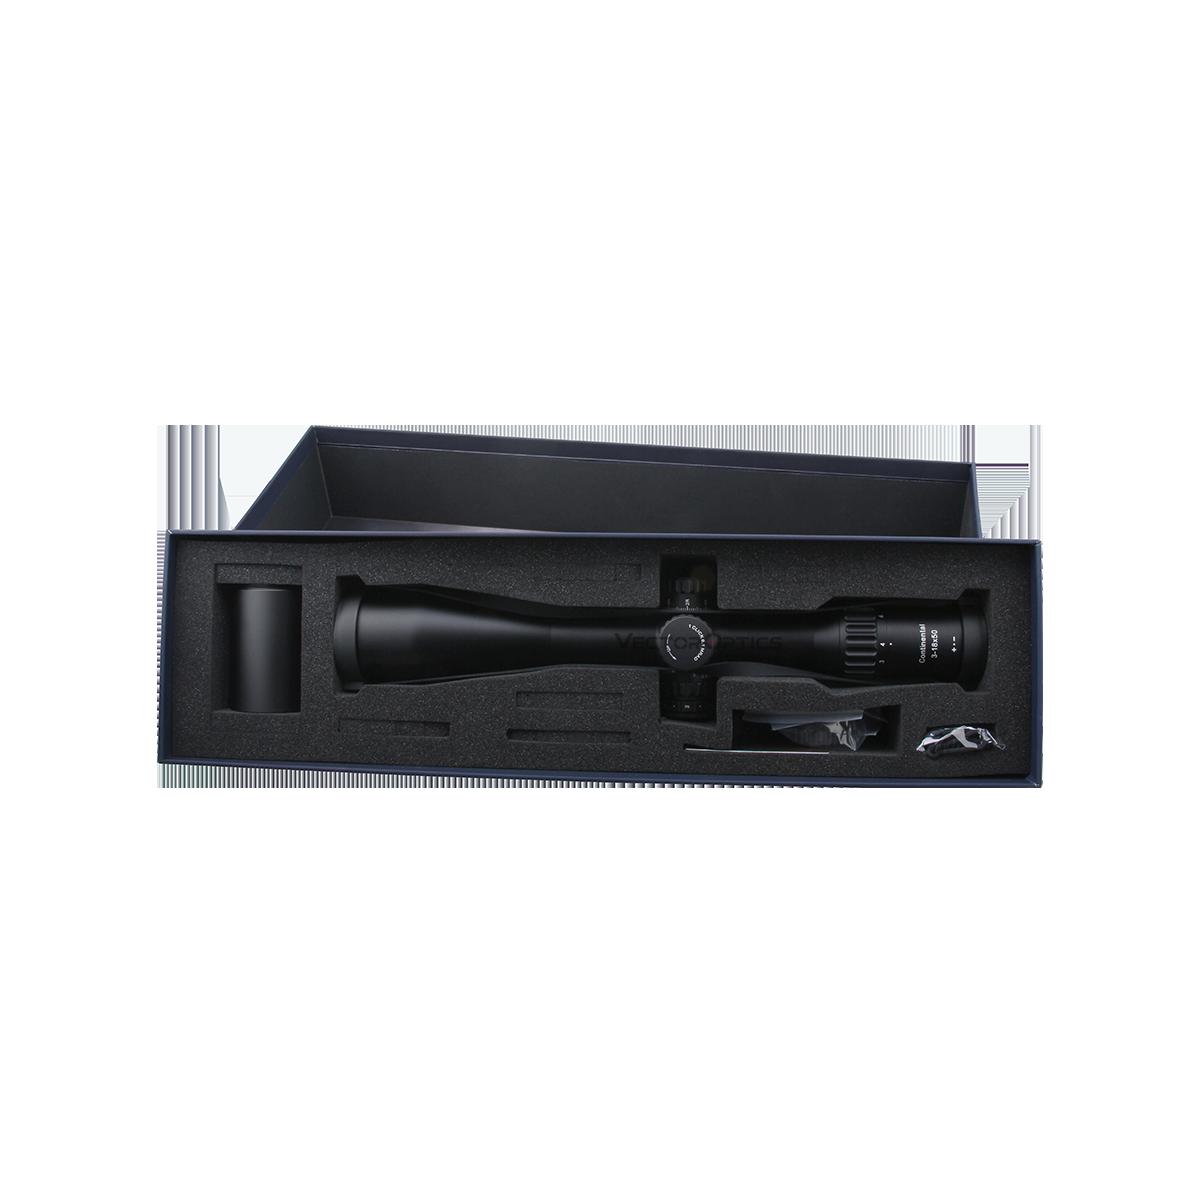 Continental 3-18x50 Tactical Riflescope